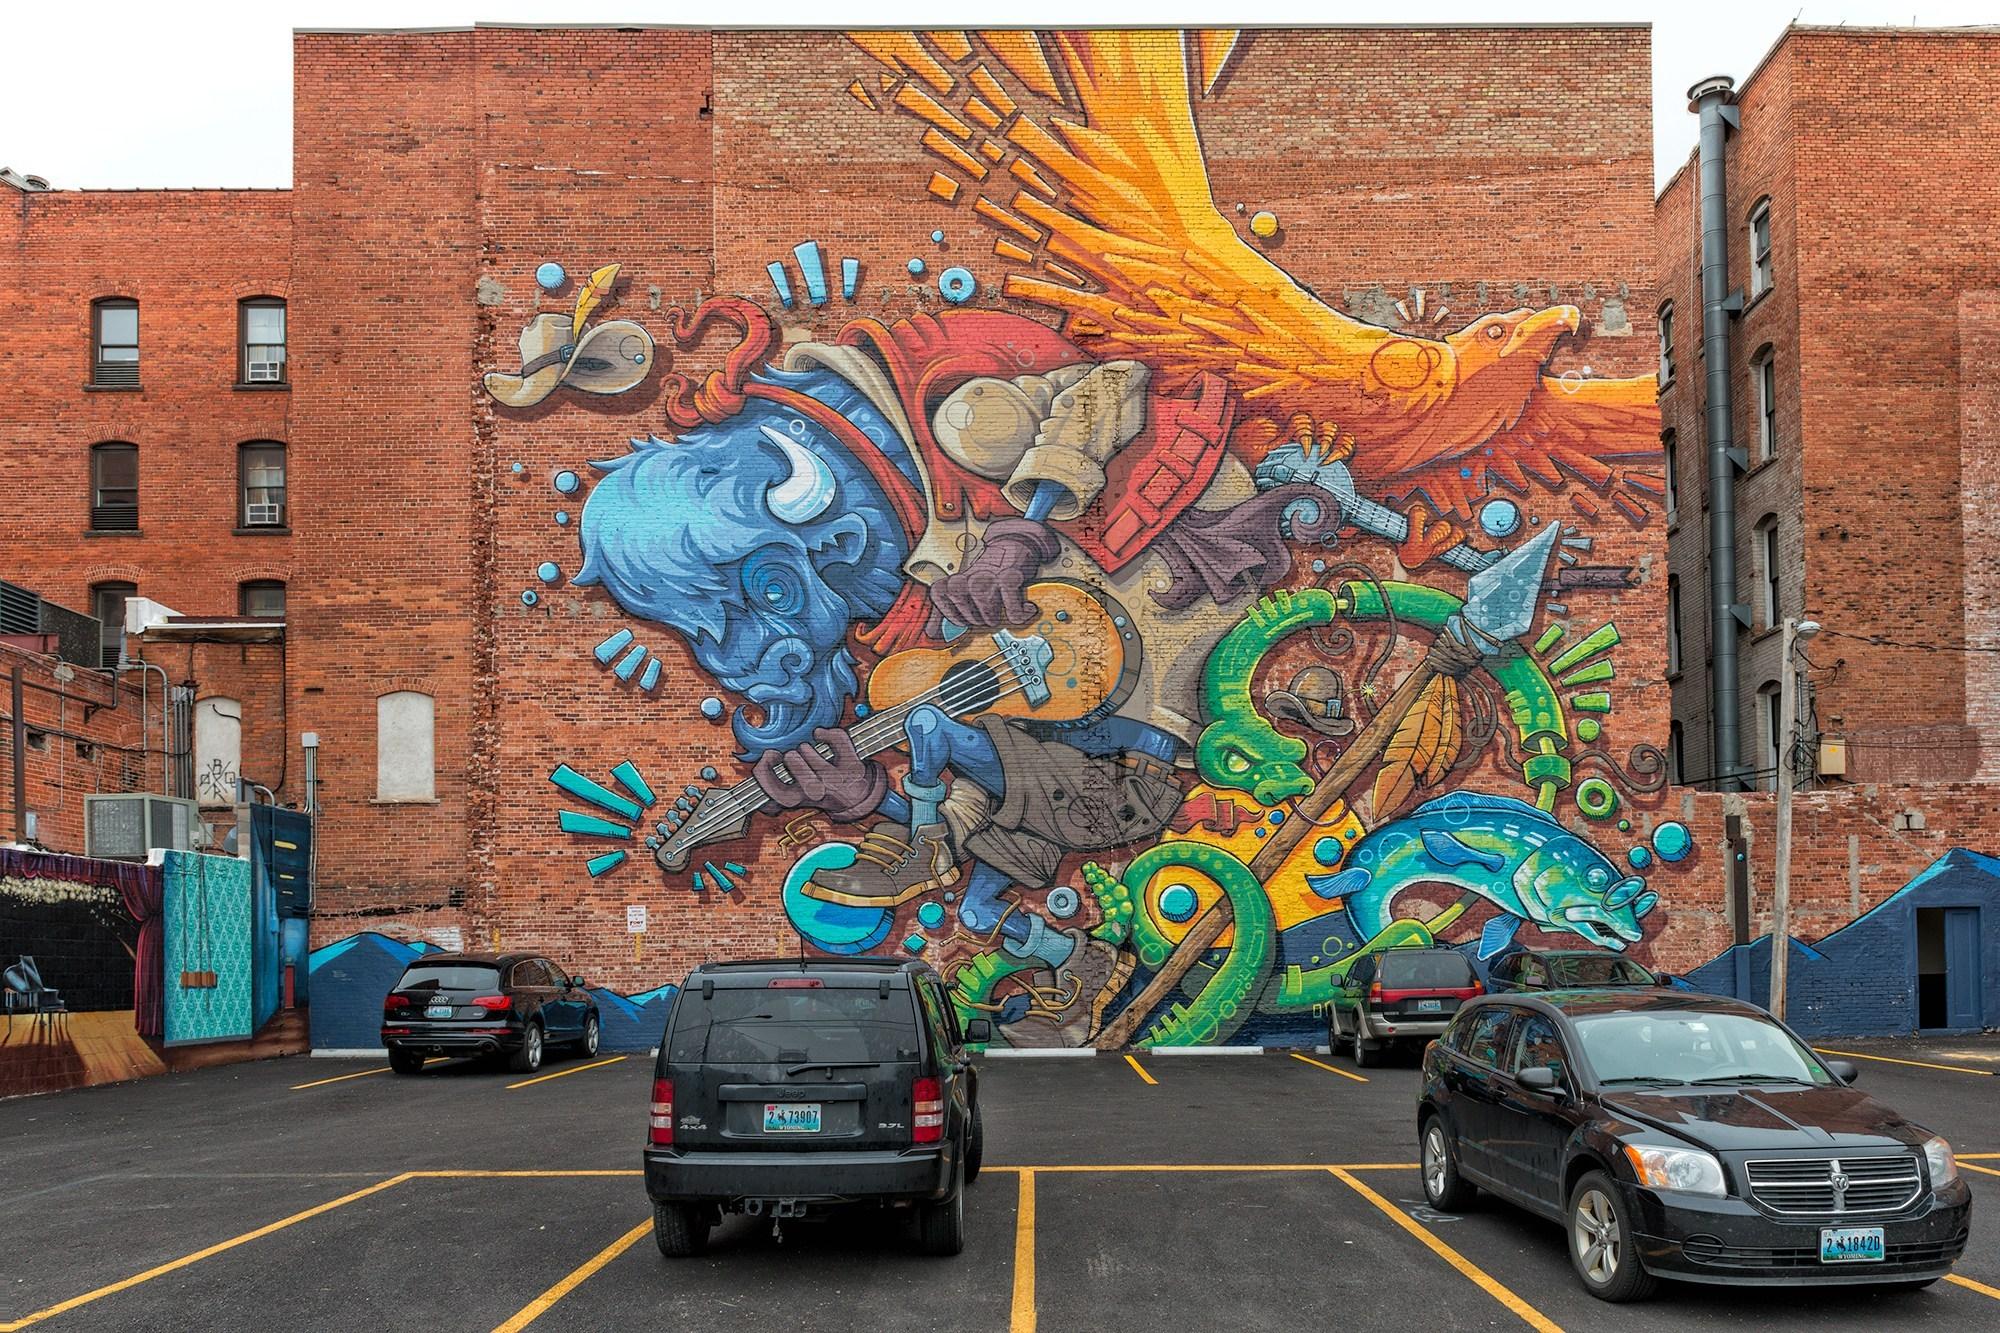 201608054183-eThe-Buffalo-Mural.jpg